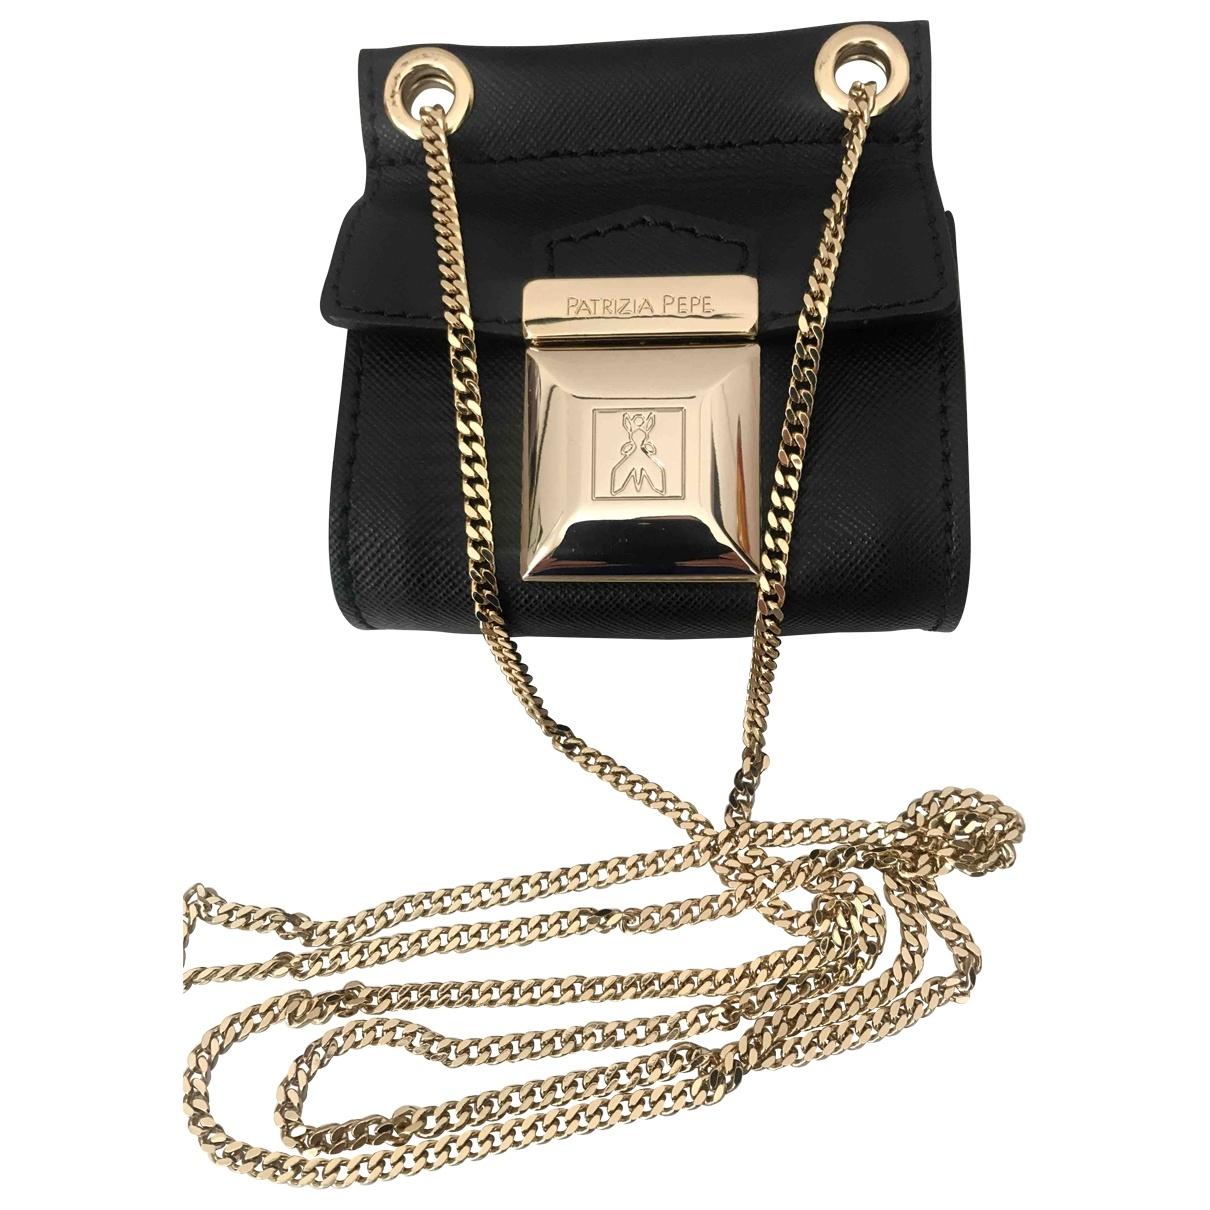 Patrizia Pepe \N Black Leather Clutch bag for Women \N